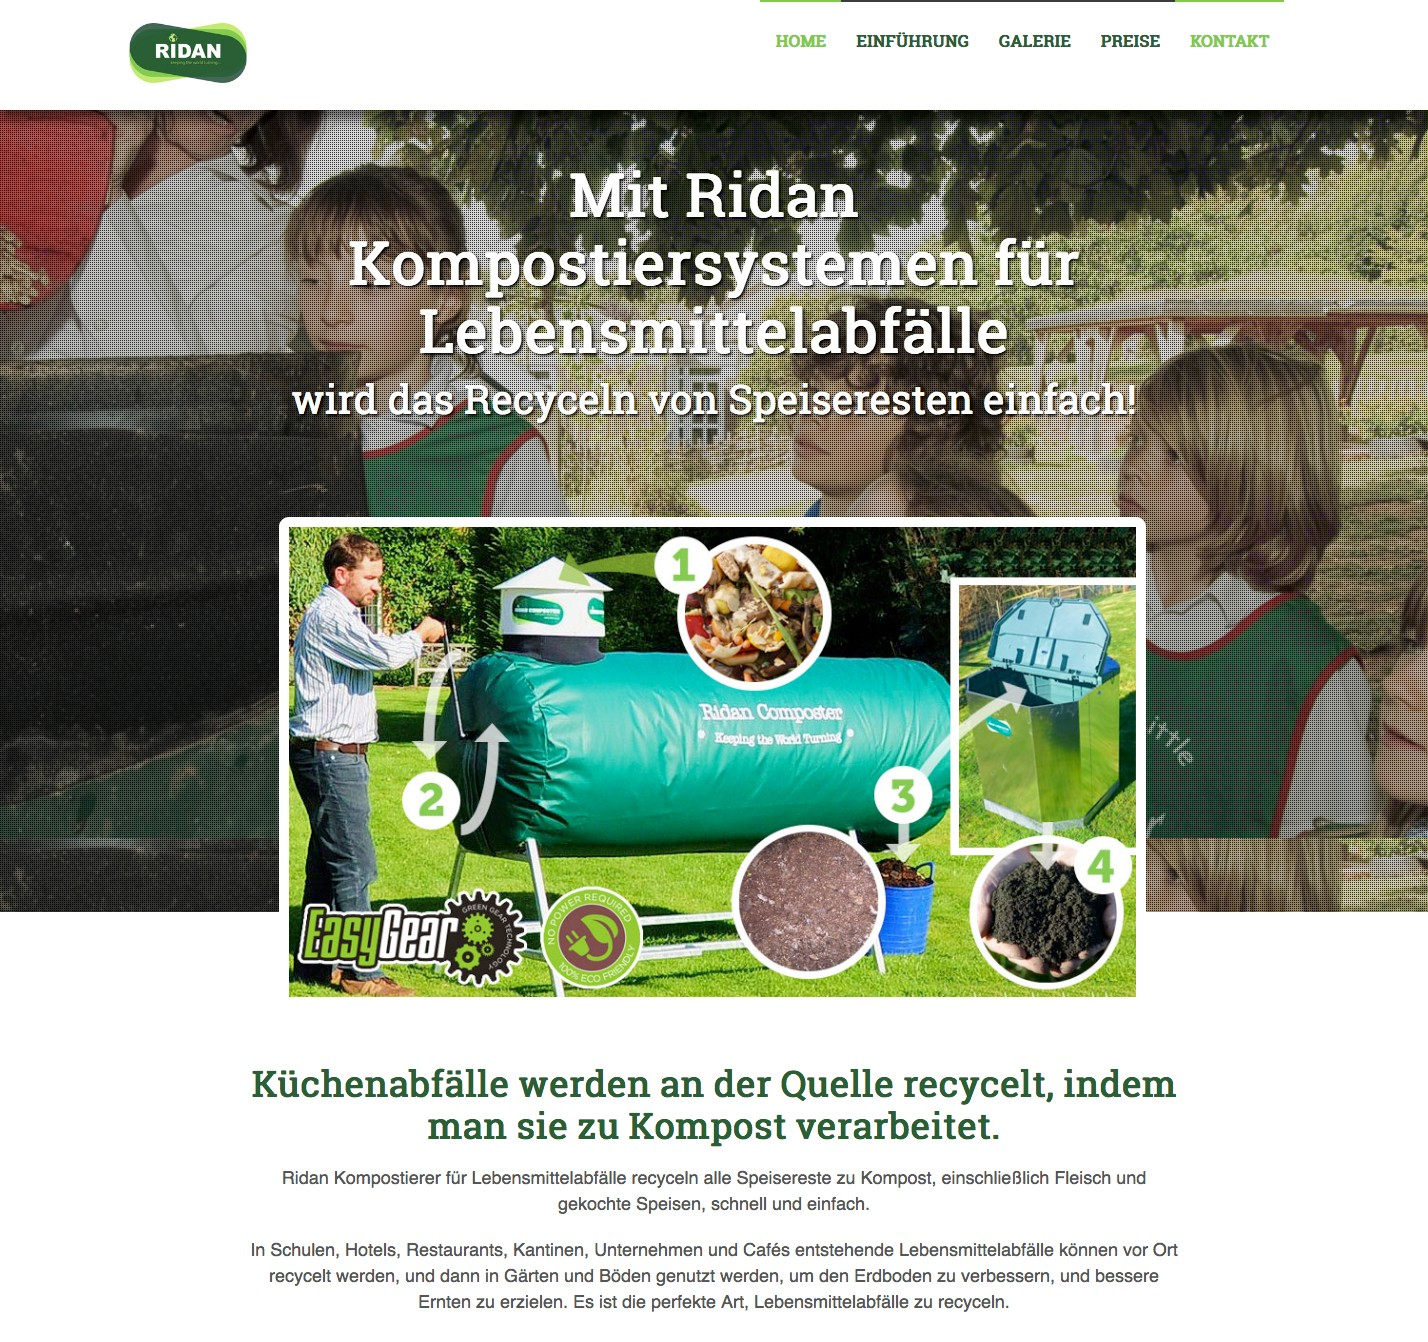 Ridan.de website